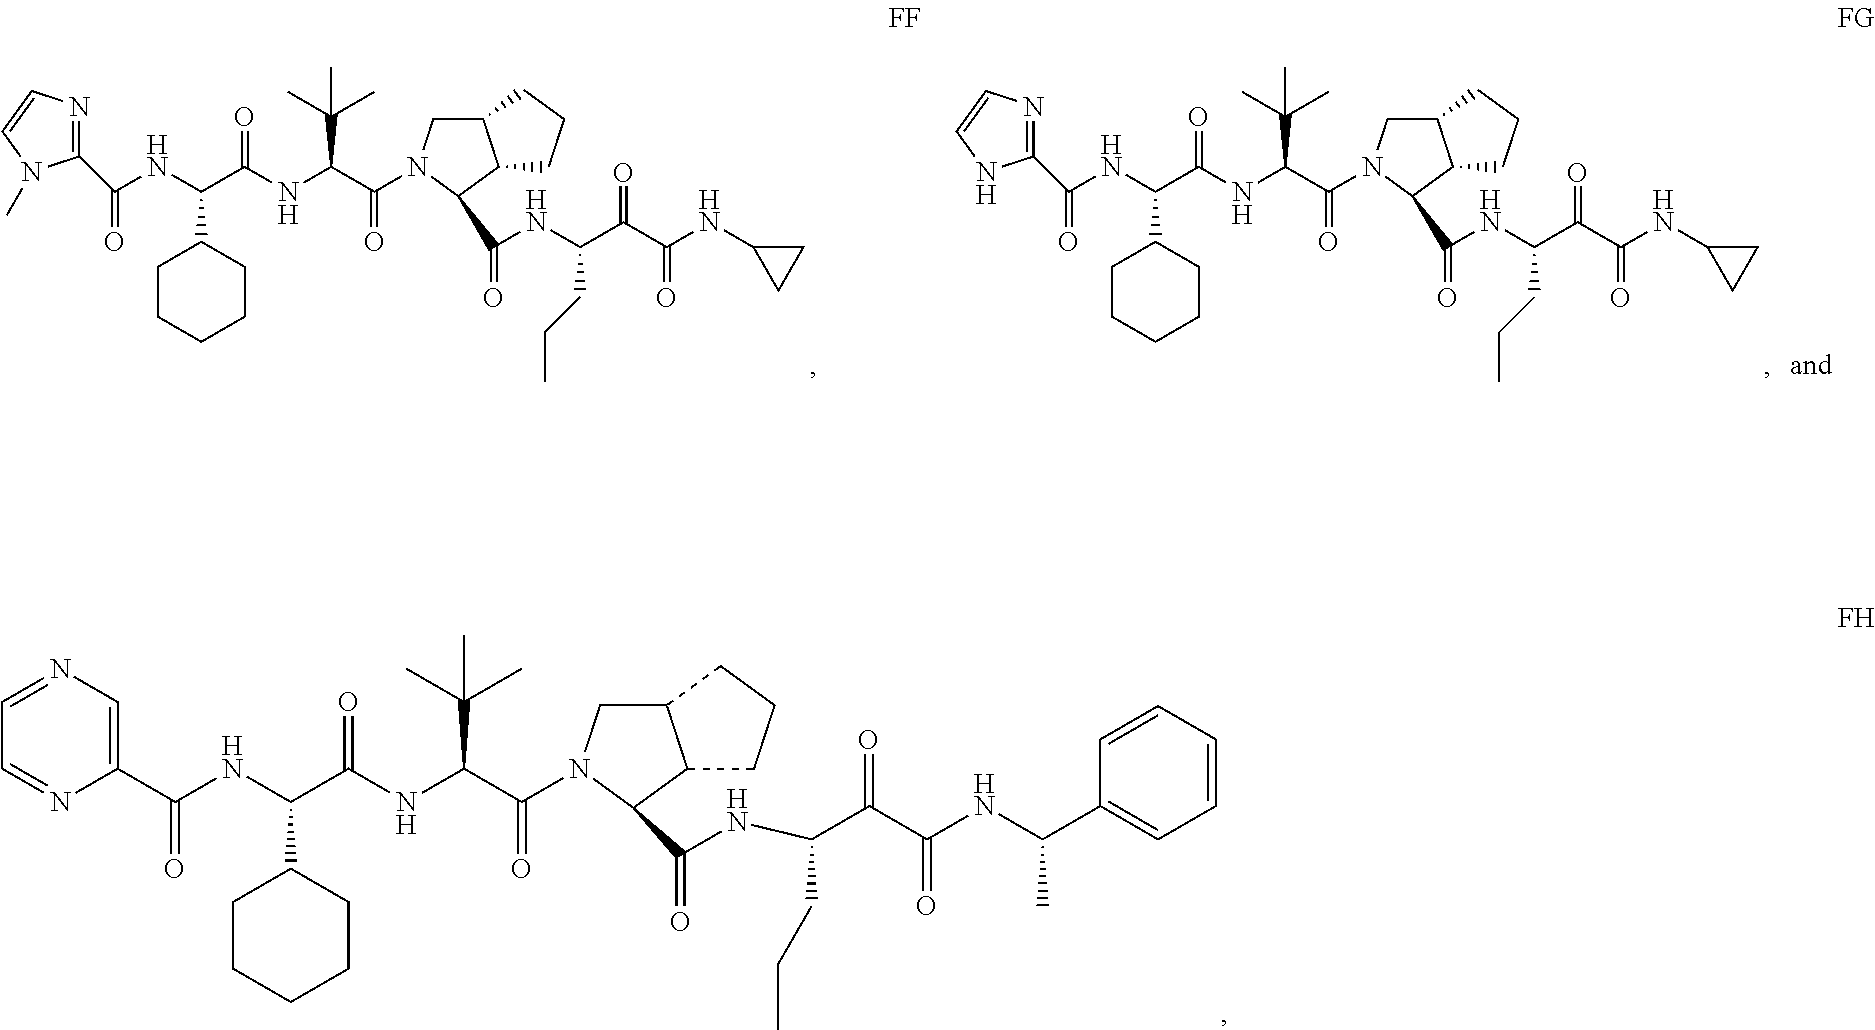 Us20140294763a1 Peptidomimetic Protease Inhibitors Google Patents Wiring Diagram Lowe 165 Fm Figure 20141002 C00081